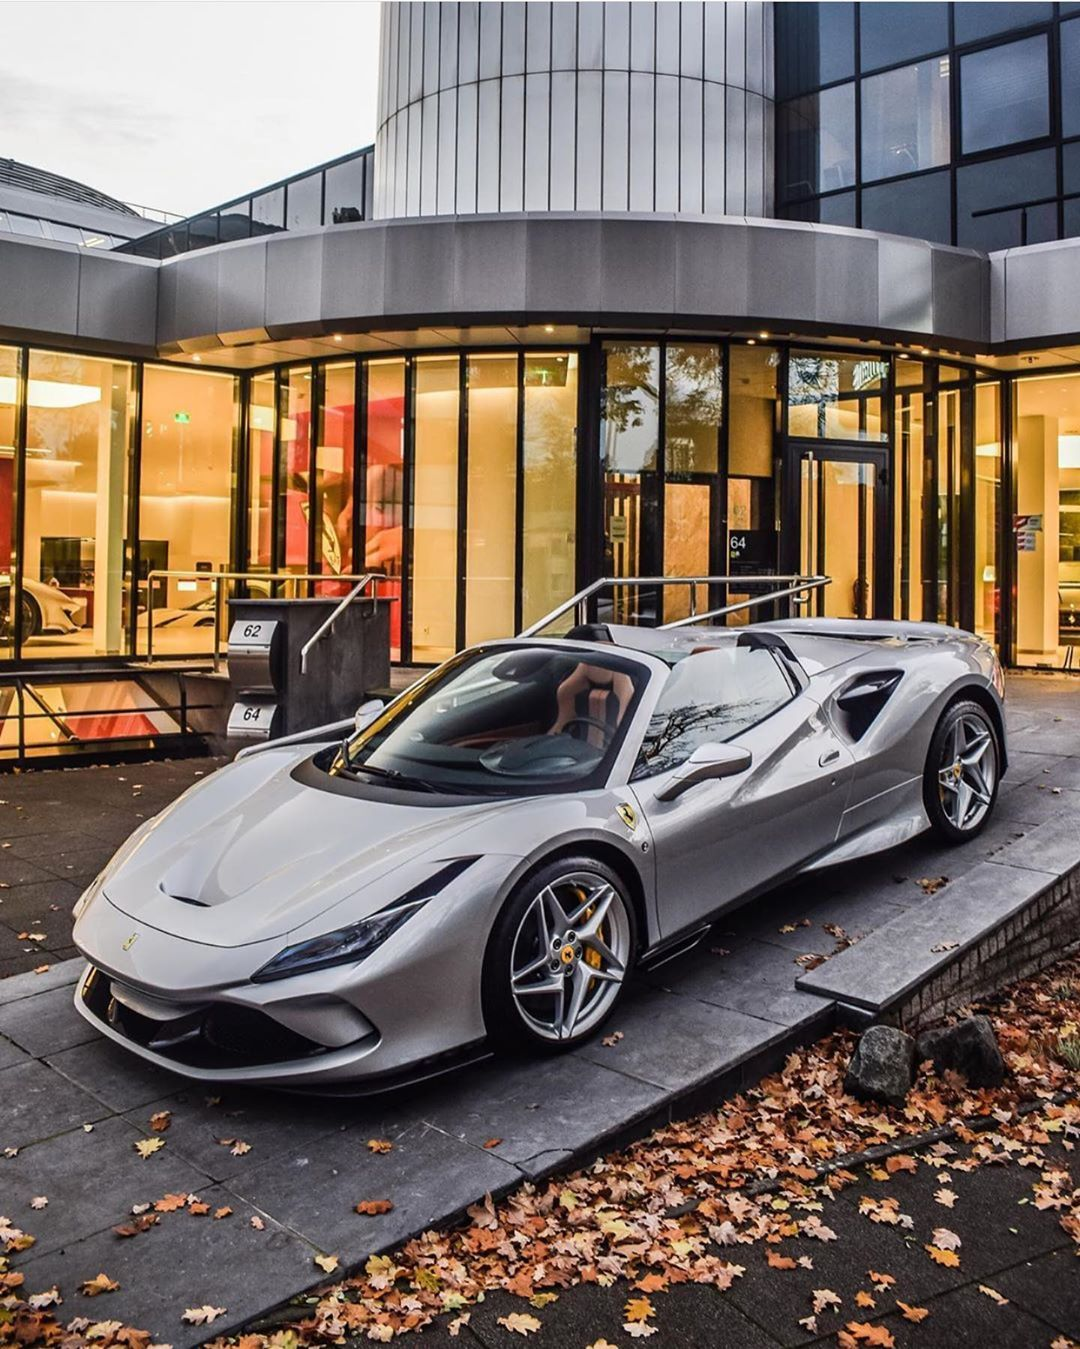 4 406 Vpodoban 16 Komentariv Ferrari F8 Tributo F8tributo V Instagram F8 Spider Arrives For Winter Rides Rossoa In 2020 Ferrari Luxury Cars Dream Cars